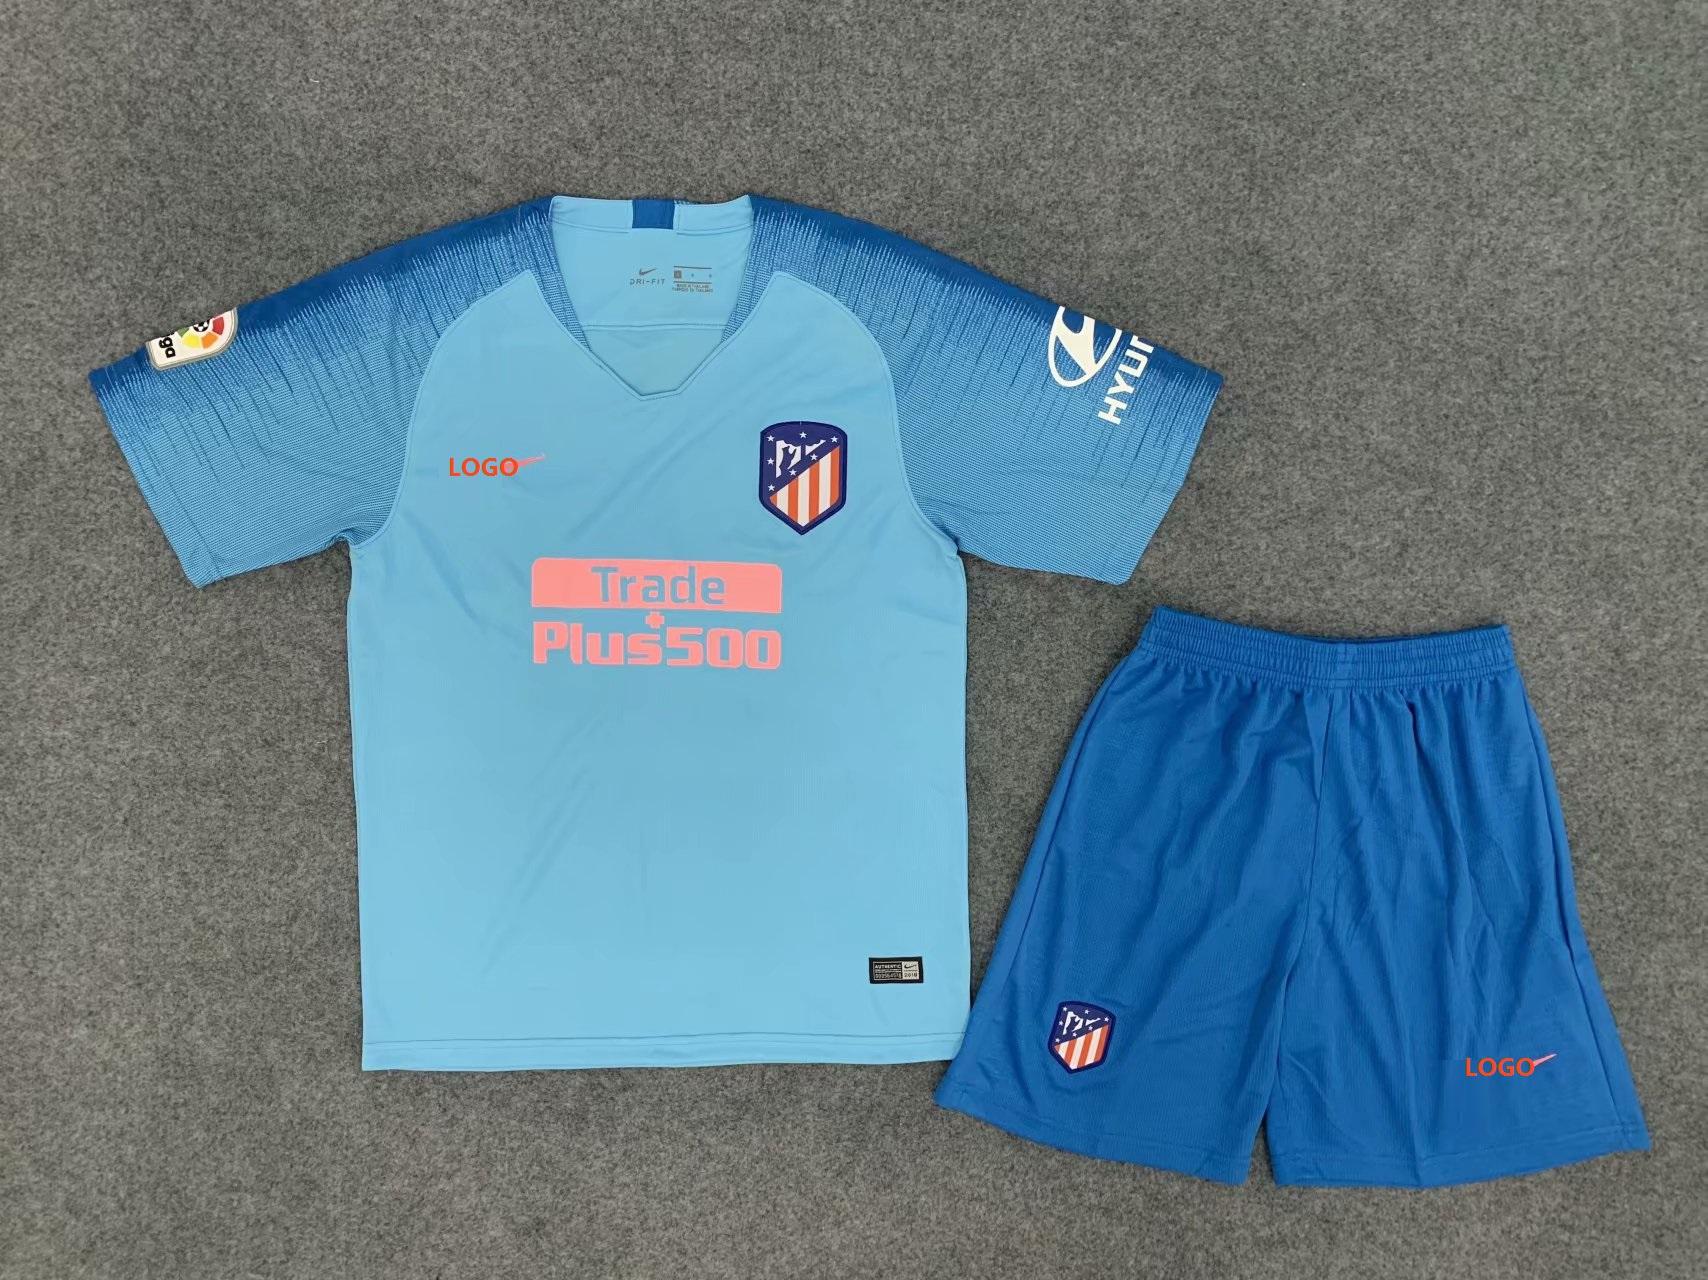 2019 20 AAA Adult Atletico Madrid Away Blue Soccer Jersey Uniform Men  Football Kits 261cecbdd